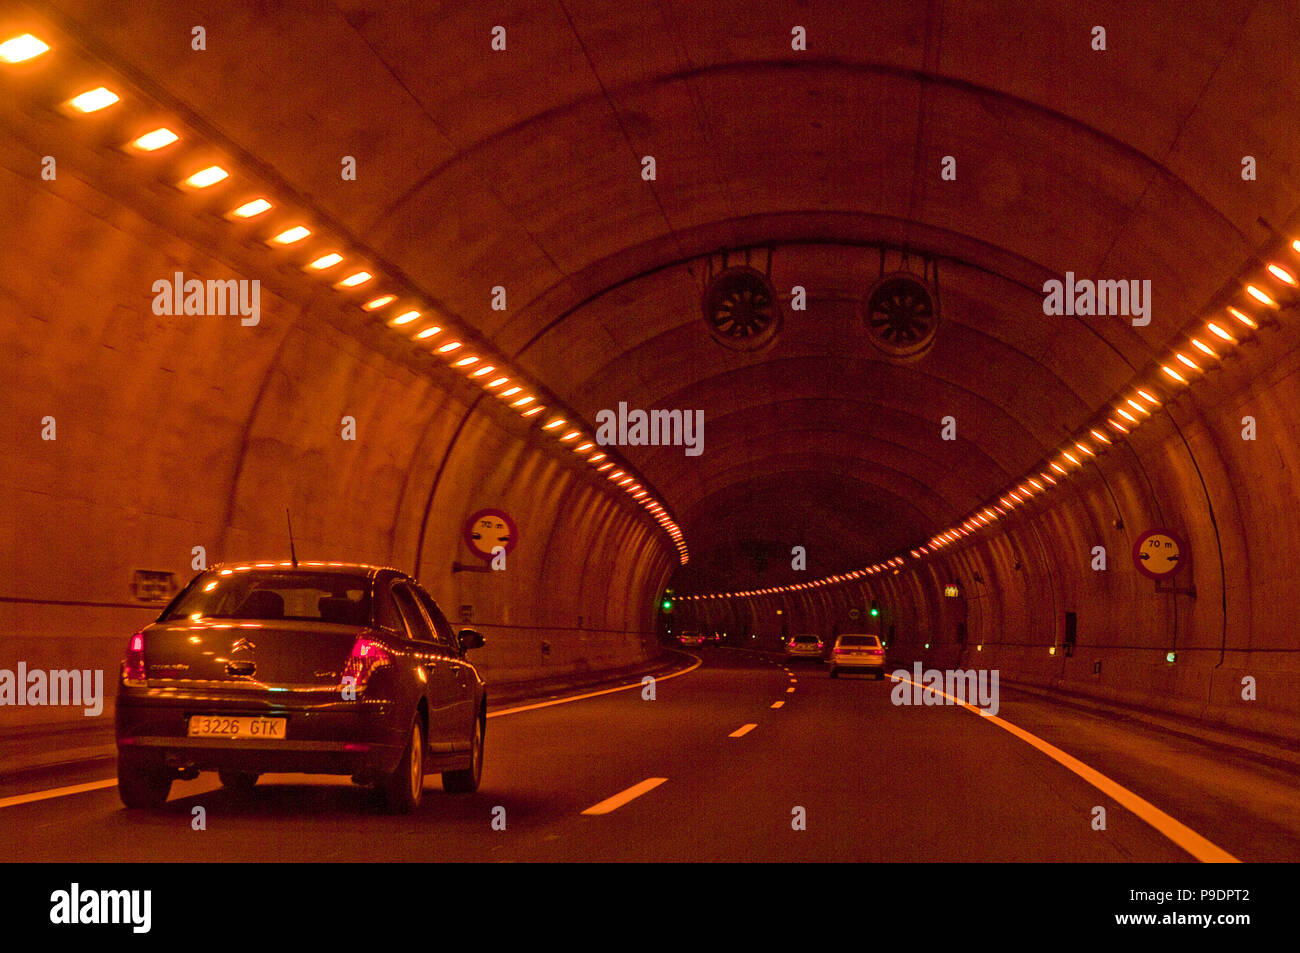 Tunnel, Cantabria-Meseta motorway. Cantabria, Spain. - Stock Image